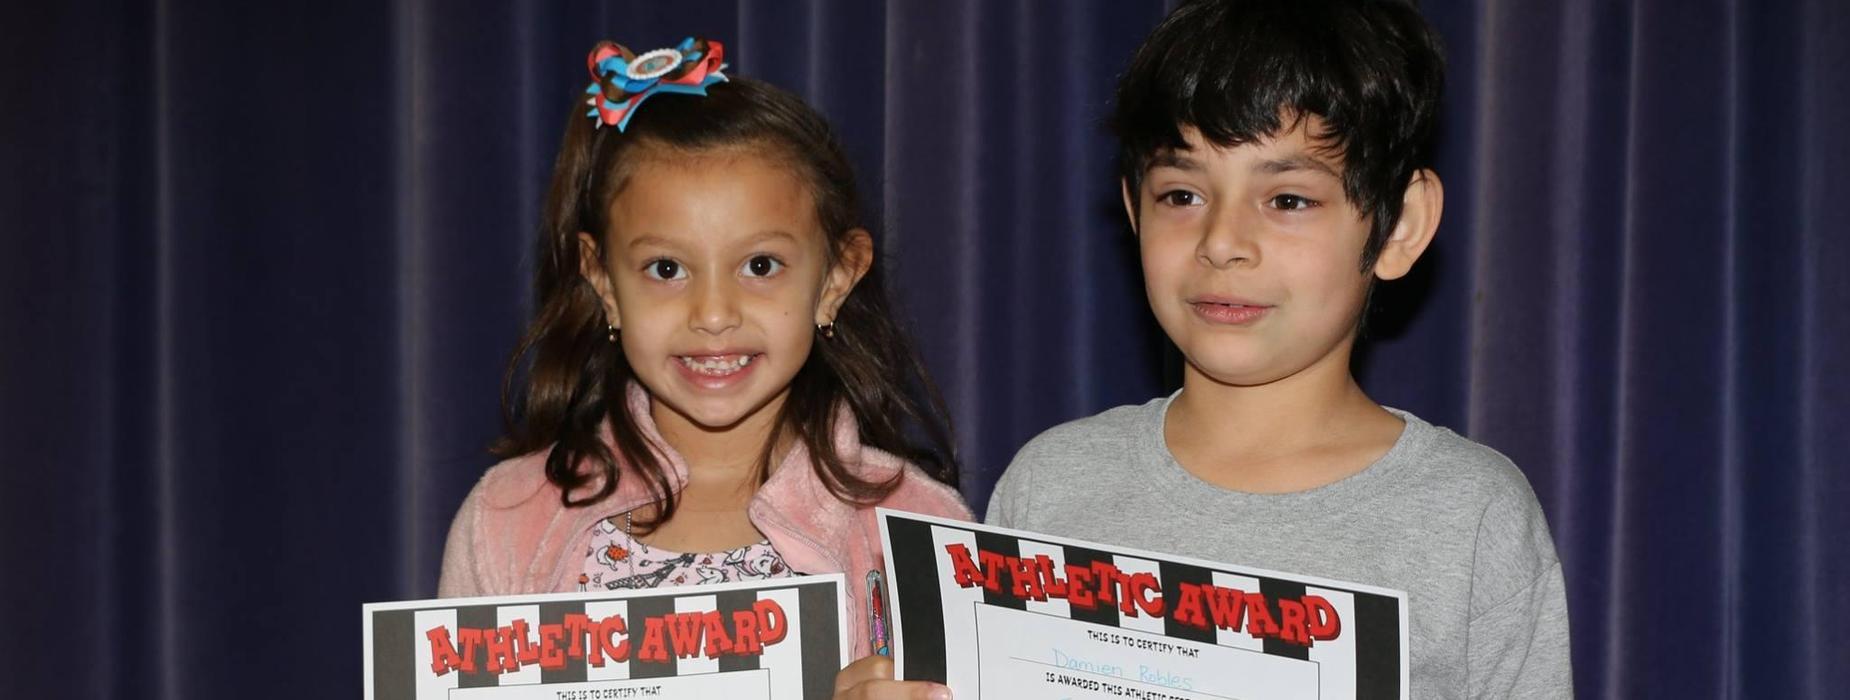 NPE Awards